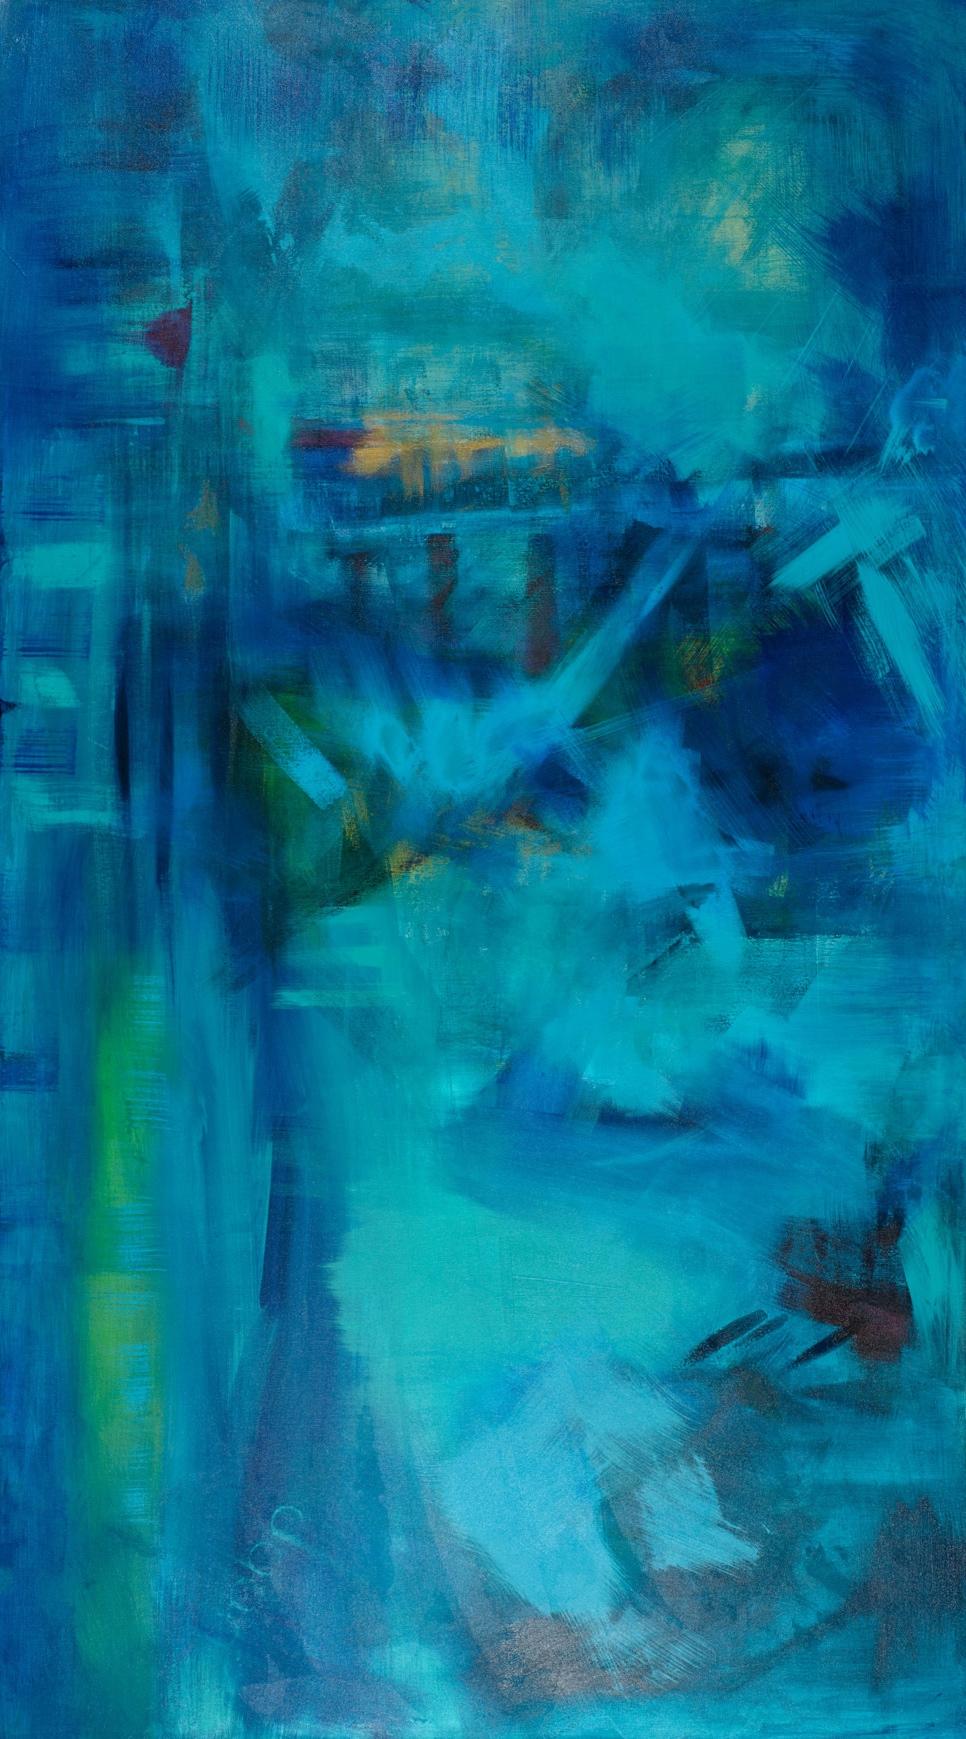 """Without Boundaries"" - 72 x 40"" - Sold - Sacramento, CA"